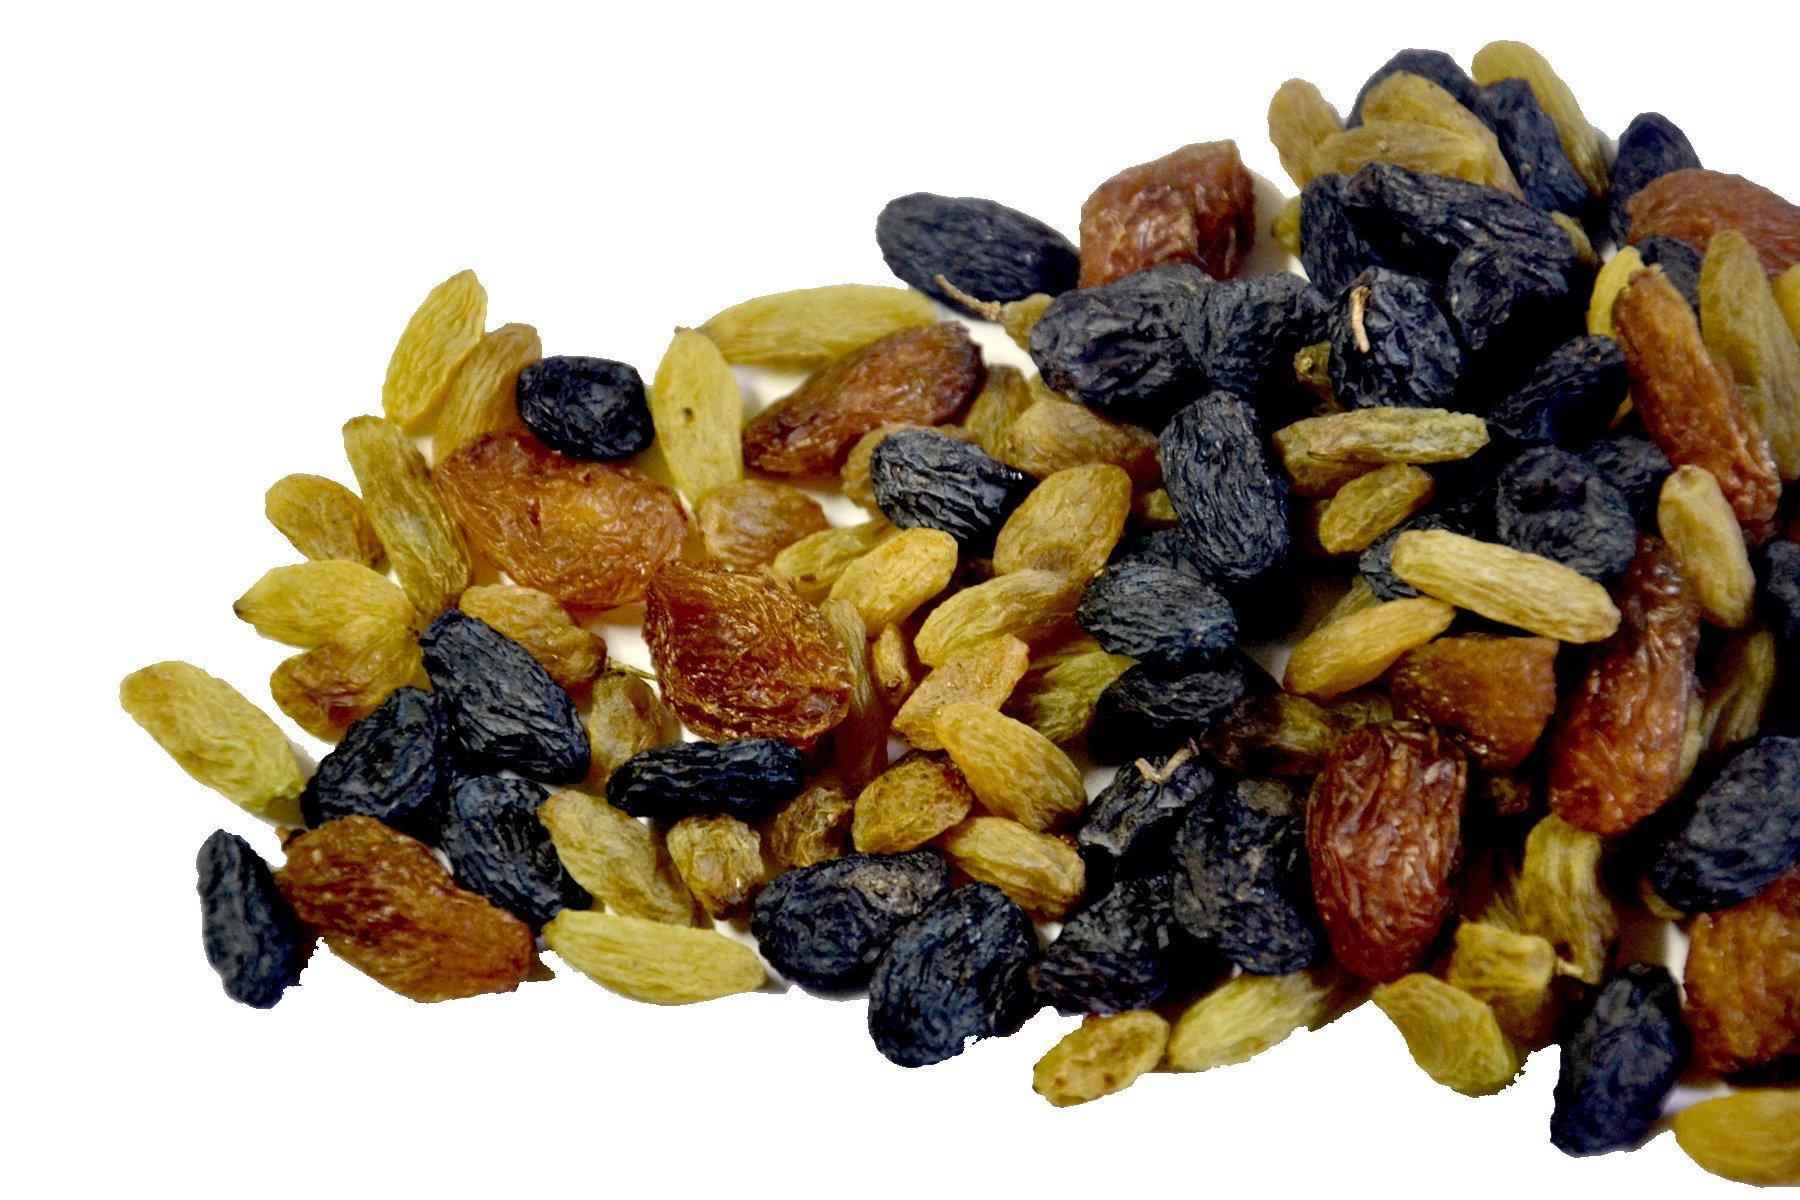 Leeve Dry Fruits Multi Mixed Raisins Mix Kishamish - 400Gms by Leeve Dry Fruits (Image #2)